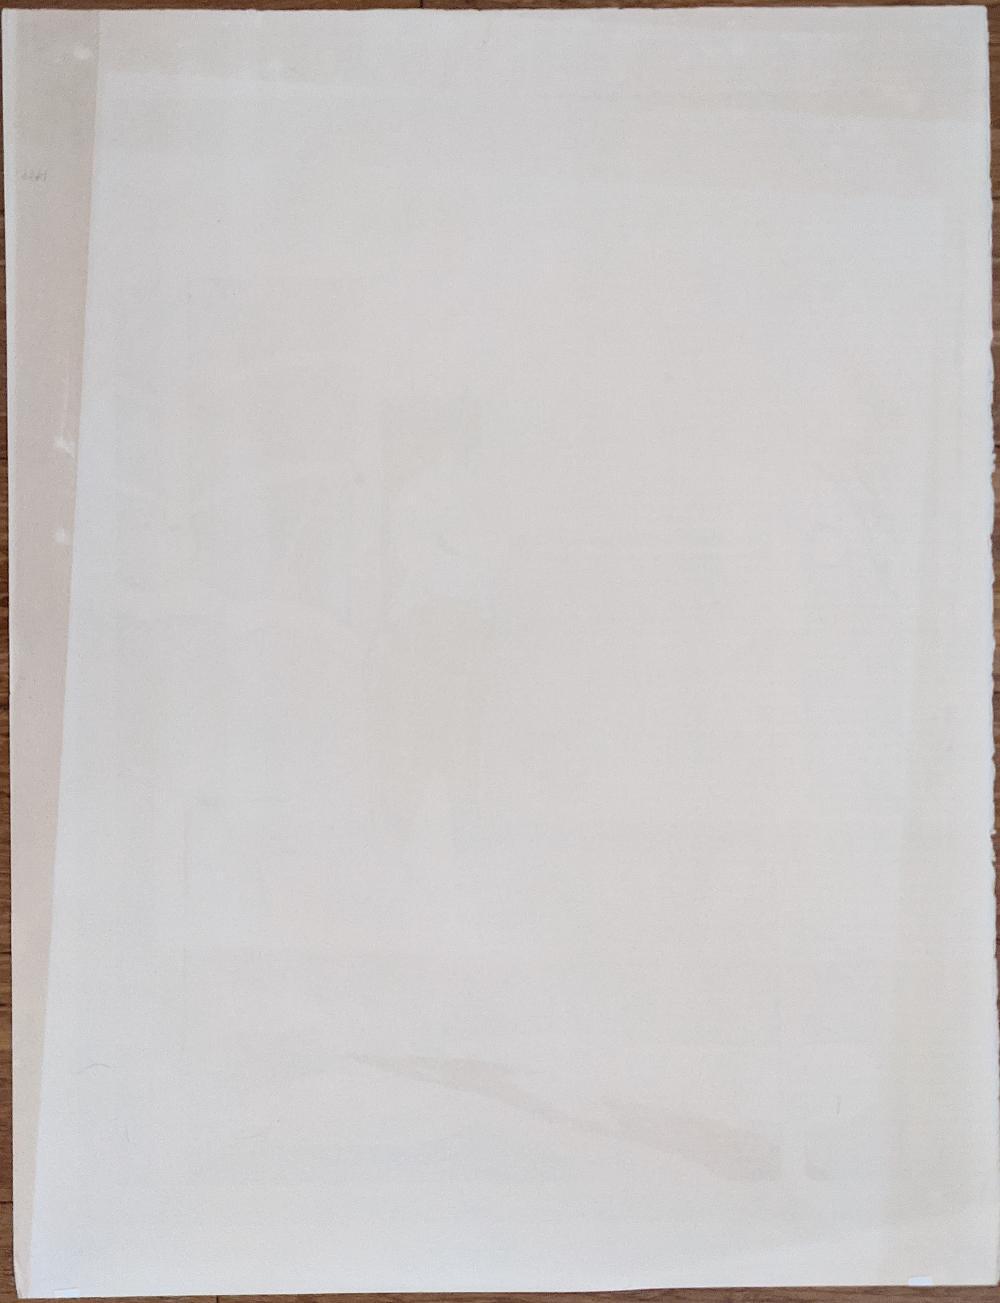 JEAN-PIERRE CASSIGNEUL Signed Original Lithograph 53/130